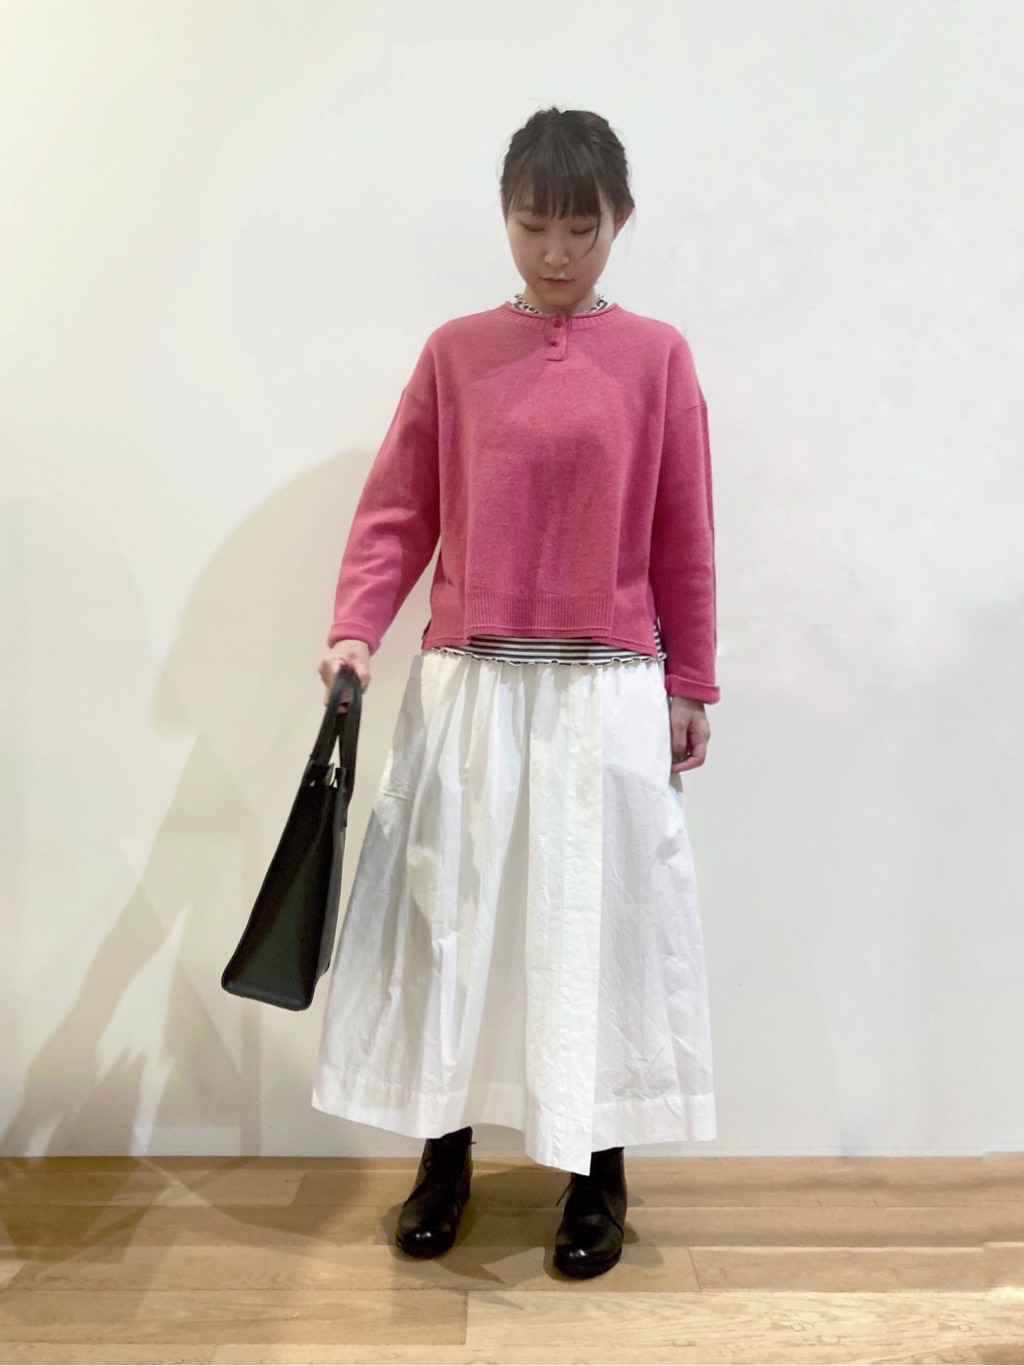 bulle de savon KITTE丸の内 身長:159cm 2020.11.13